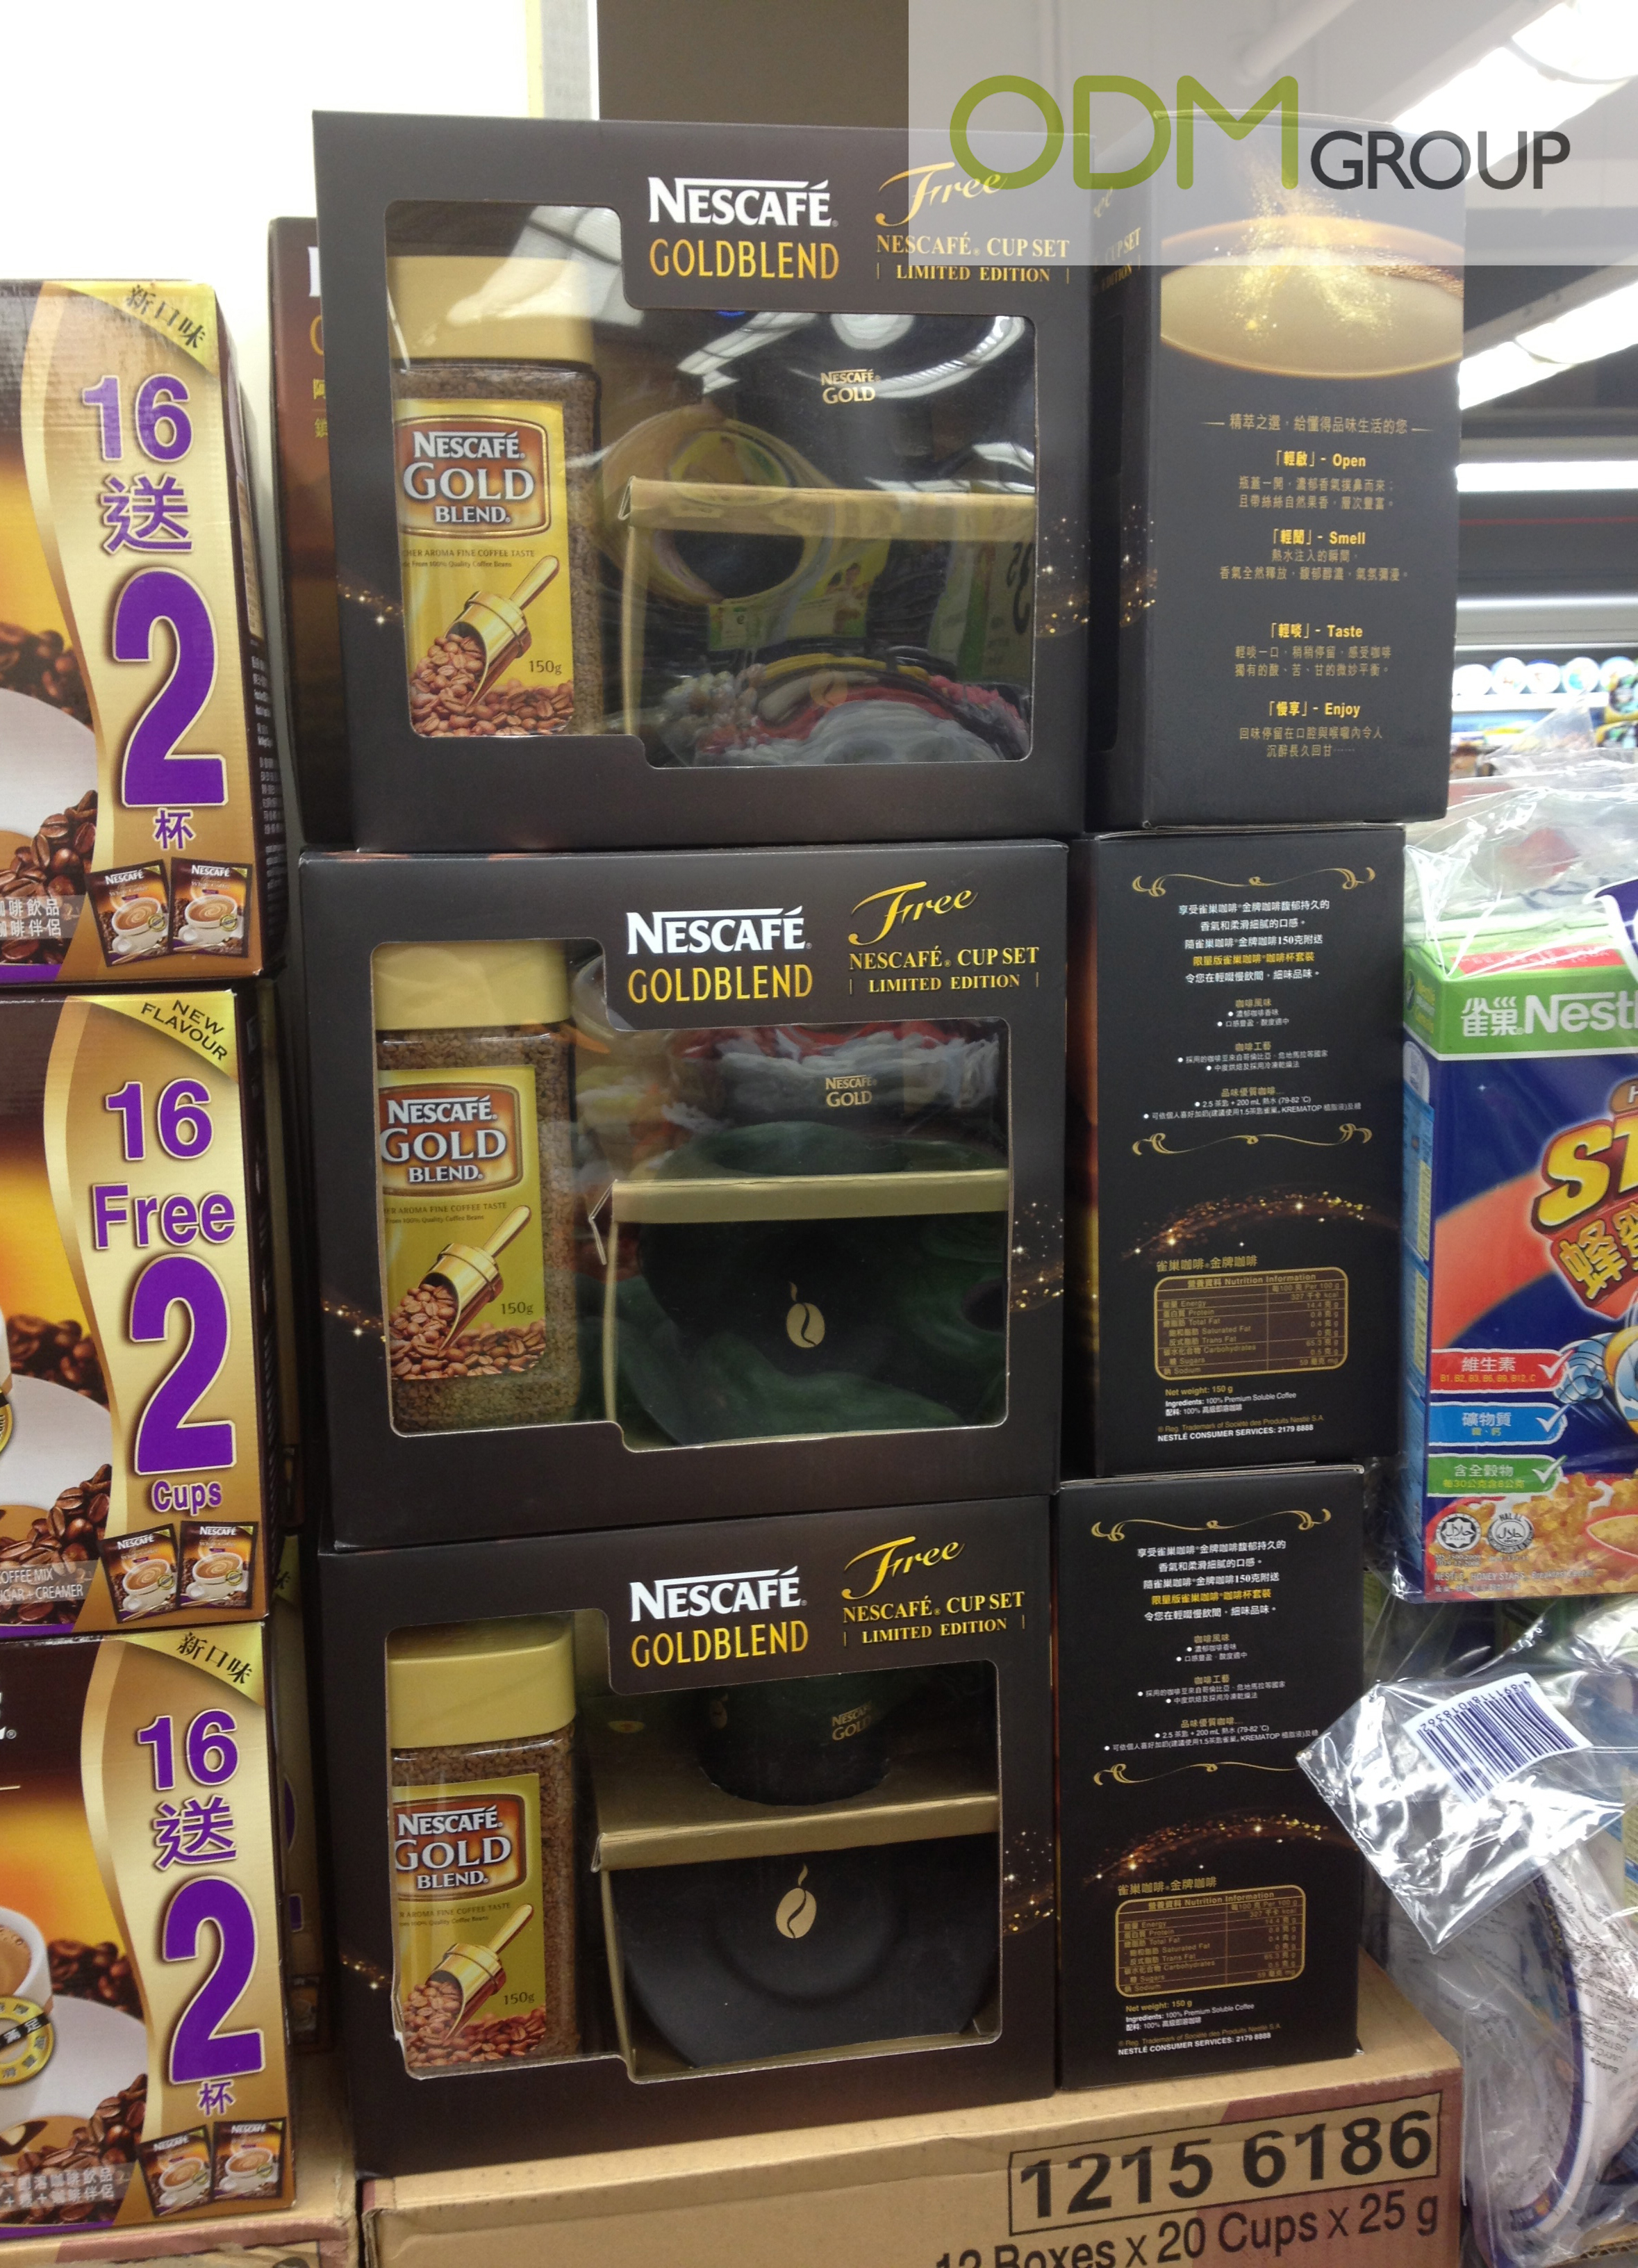 Nescafé Offers Classy Cup Set as In Store Marketing!